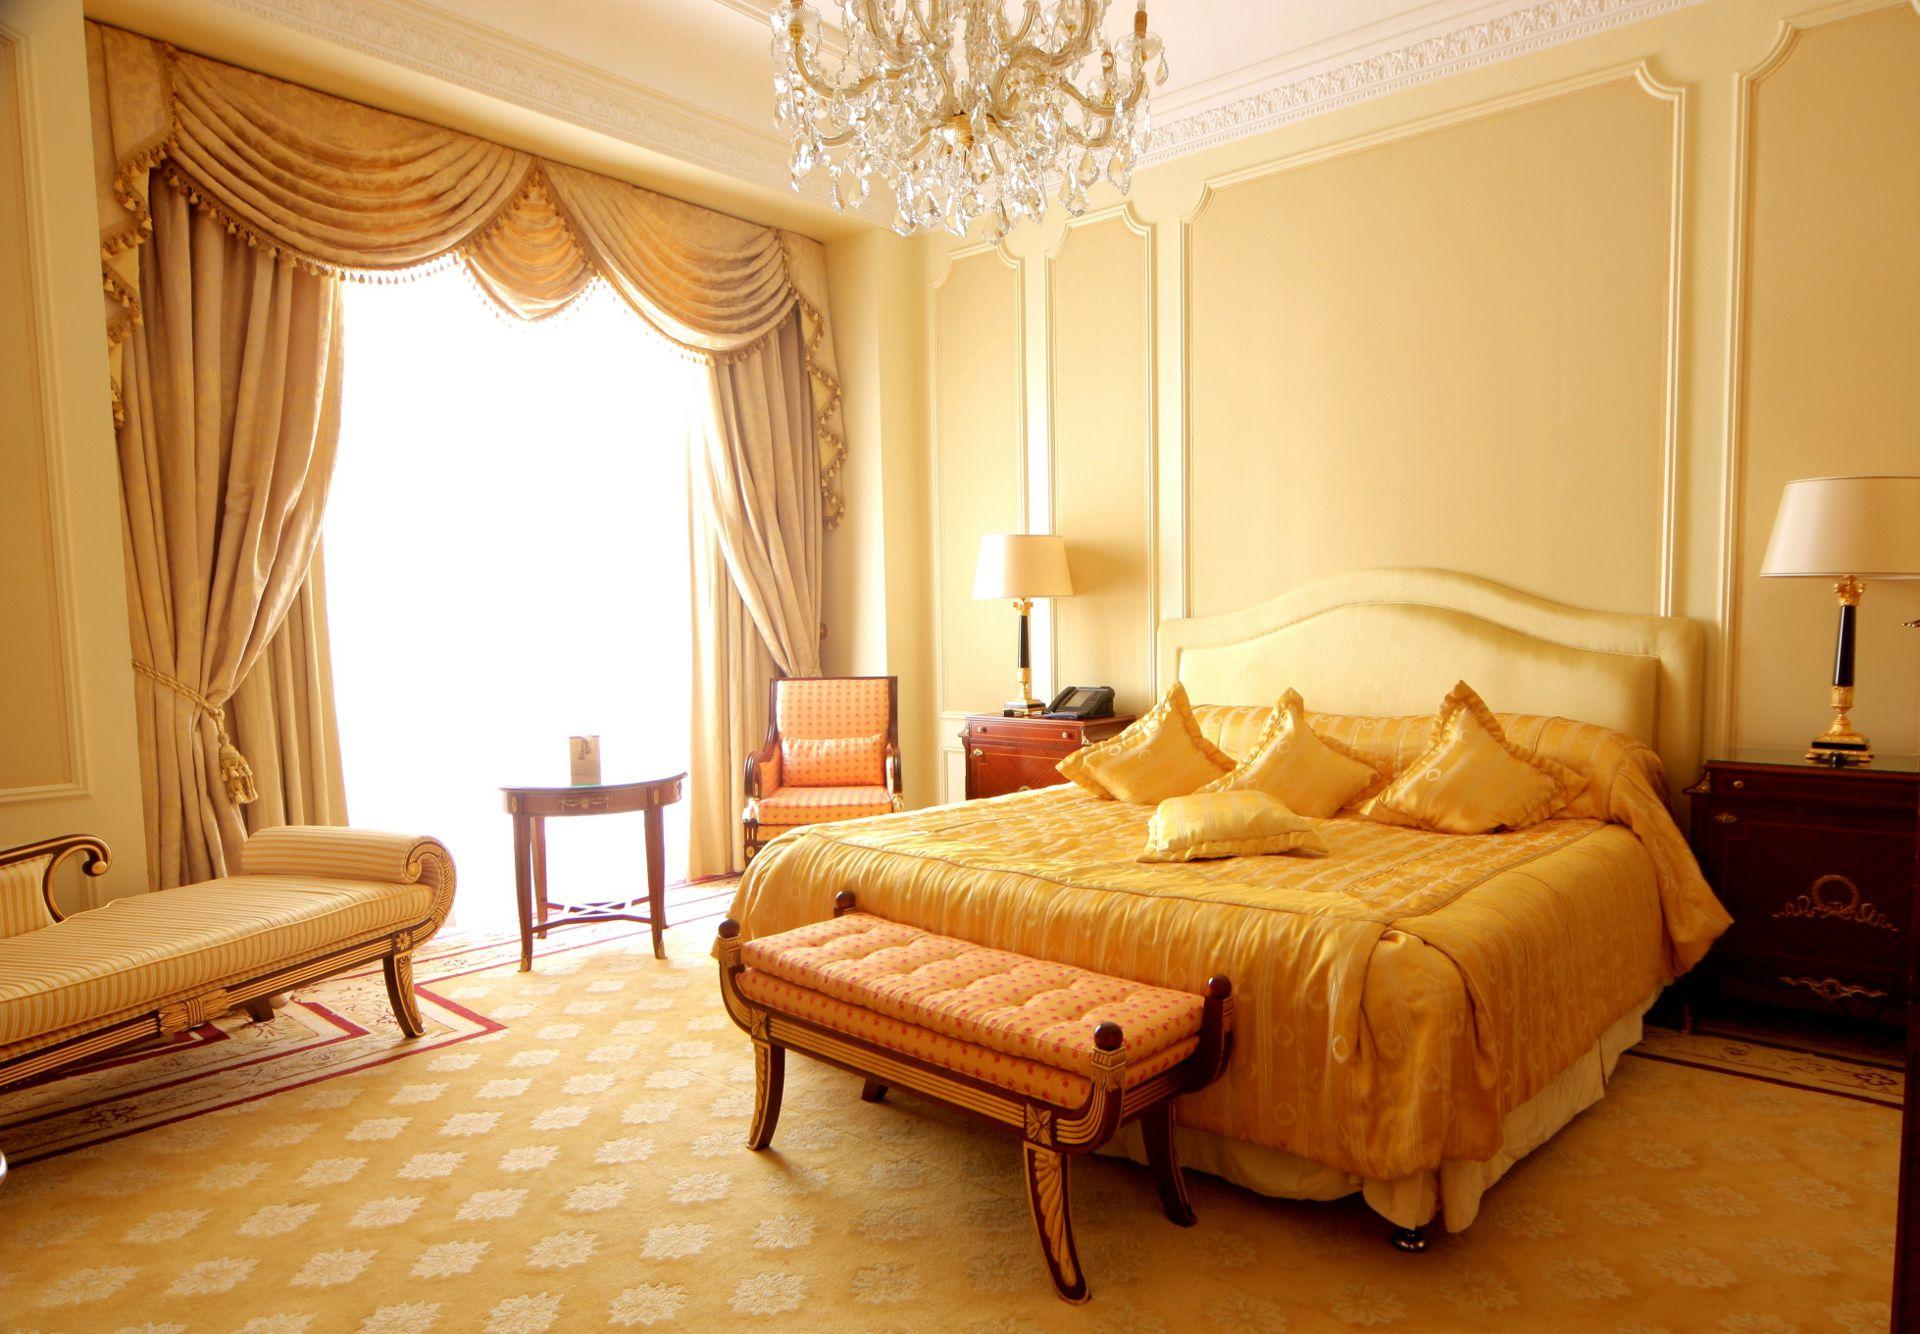 Интерьер комнаты-спальни фото